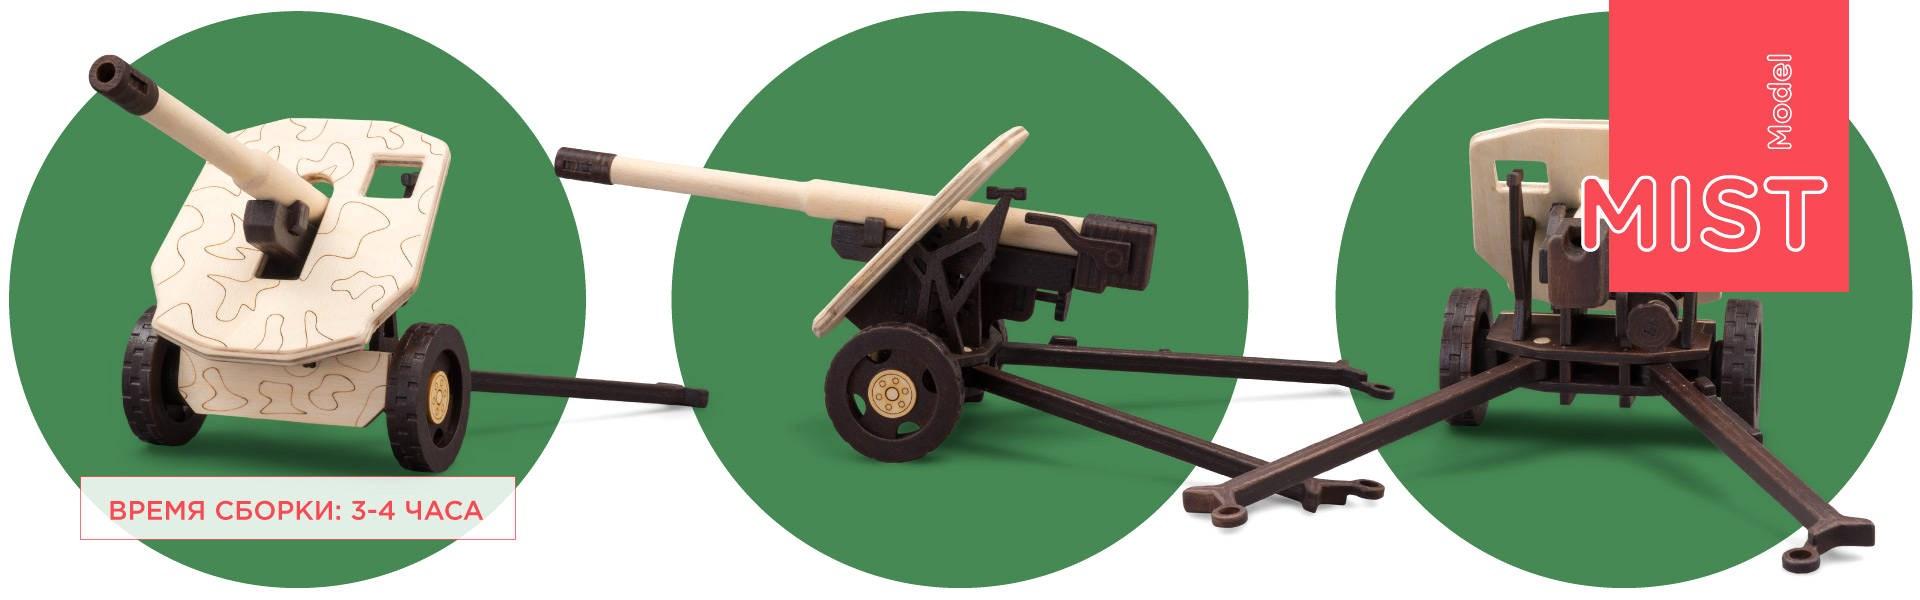 Сборная модель T.A.R.G. Mist, Пушка - фото 5091